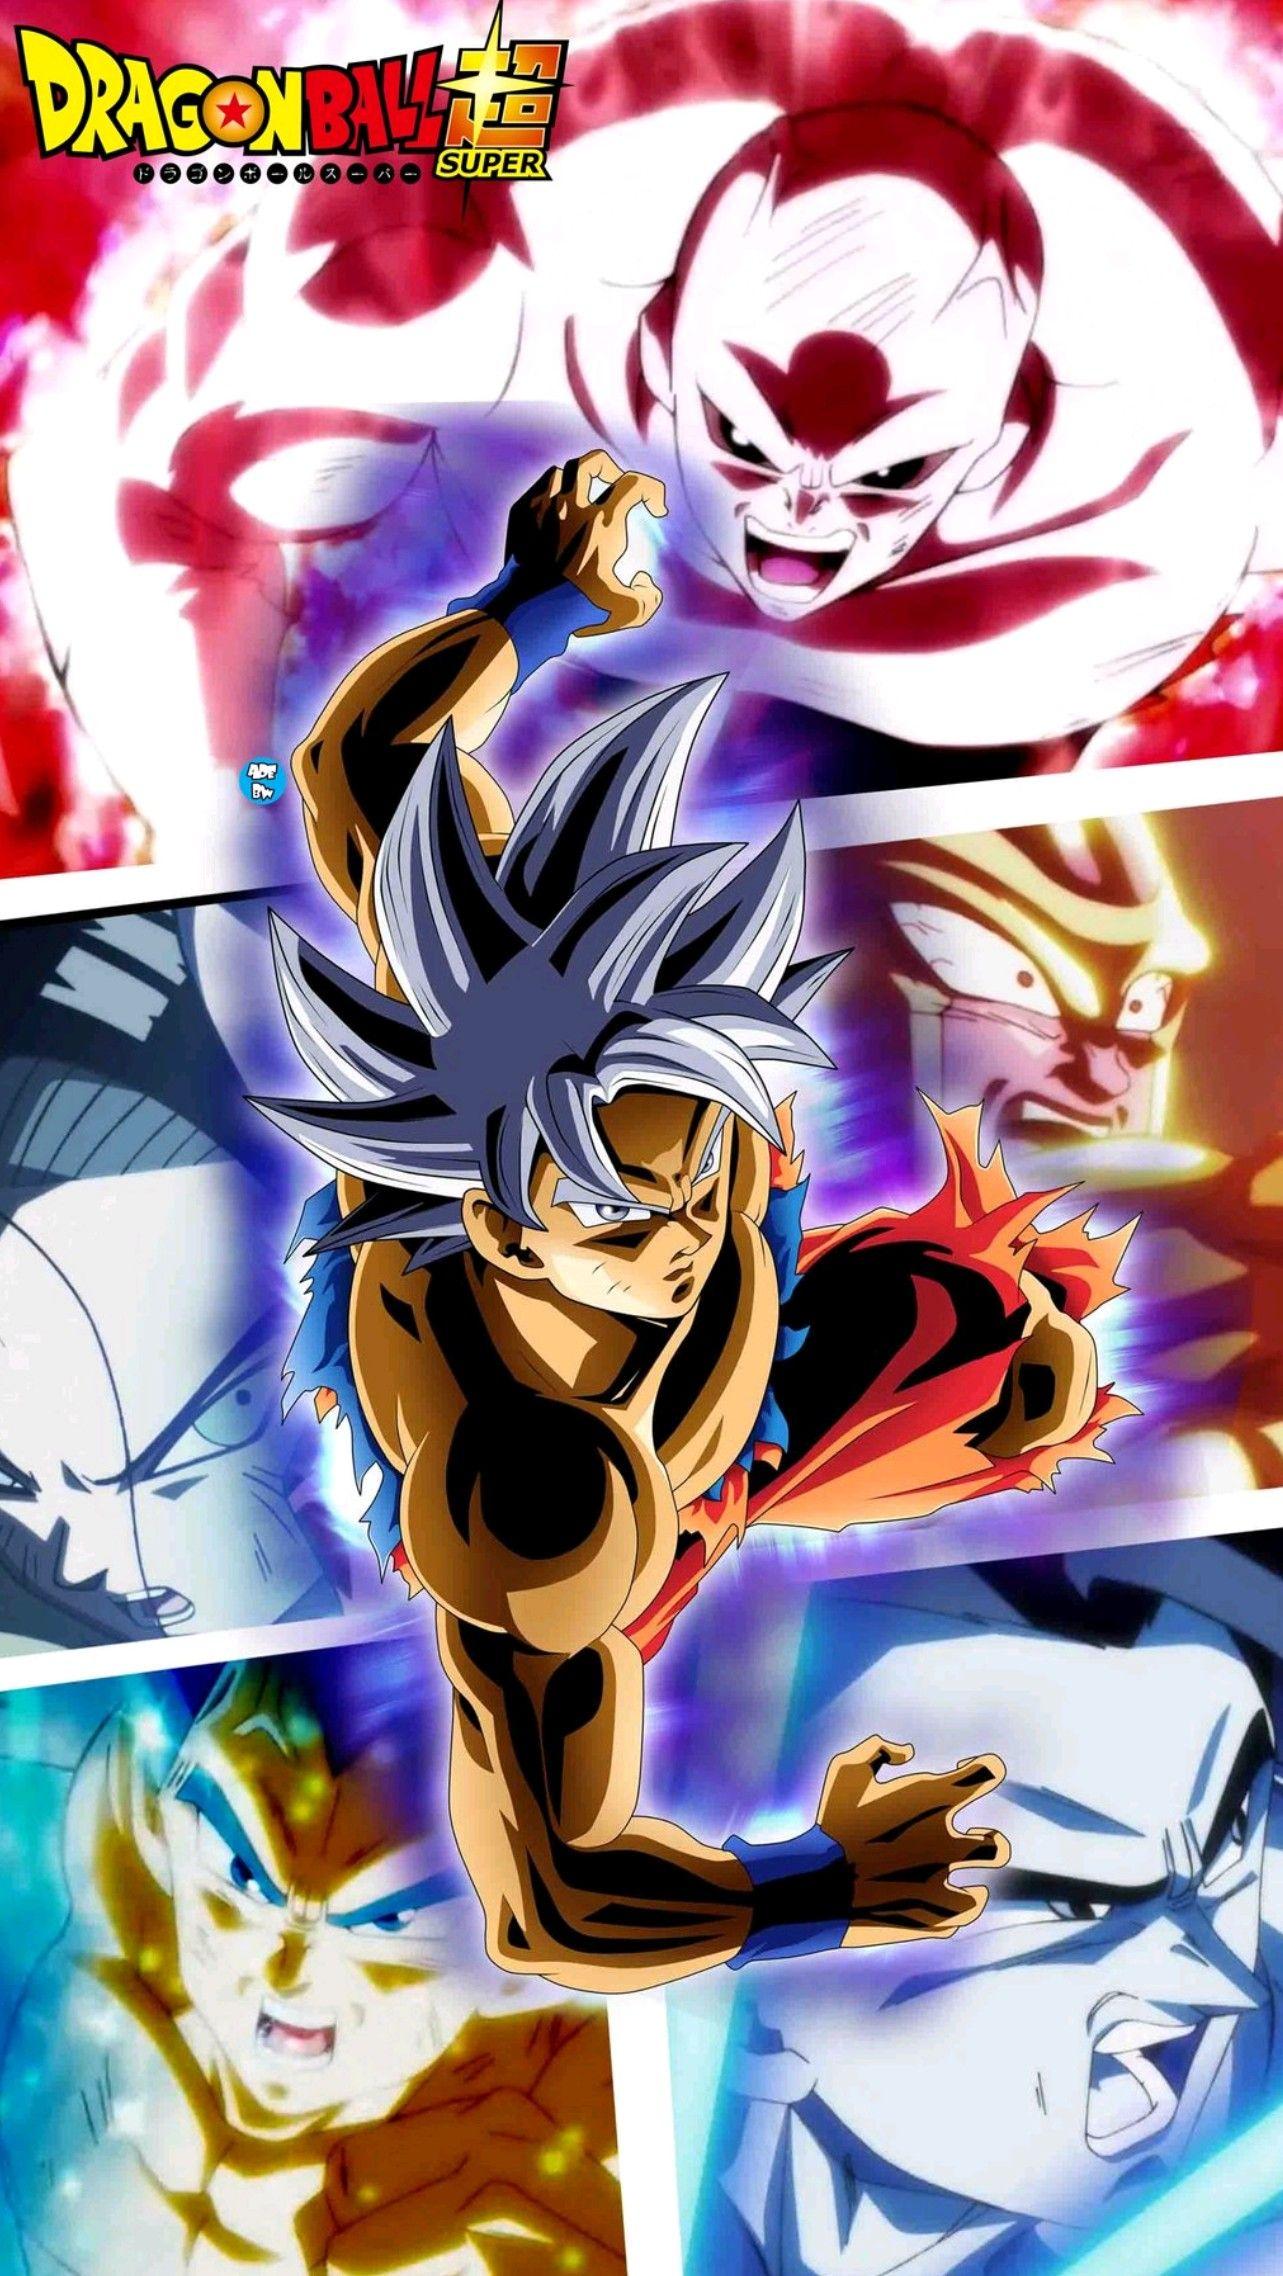 Goku Ultra Instinct Mastered Dragon Ball Super Dessin Goku Sangoku Dragon Ball Super